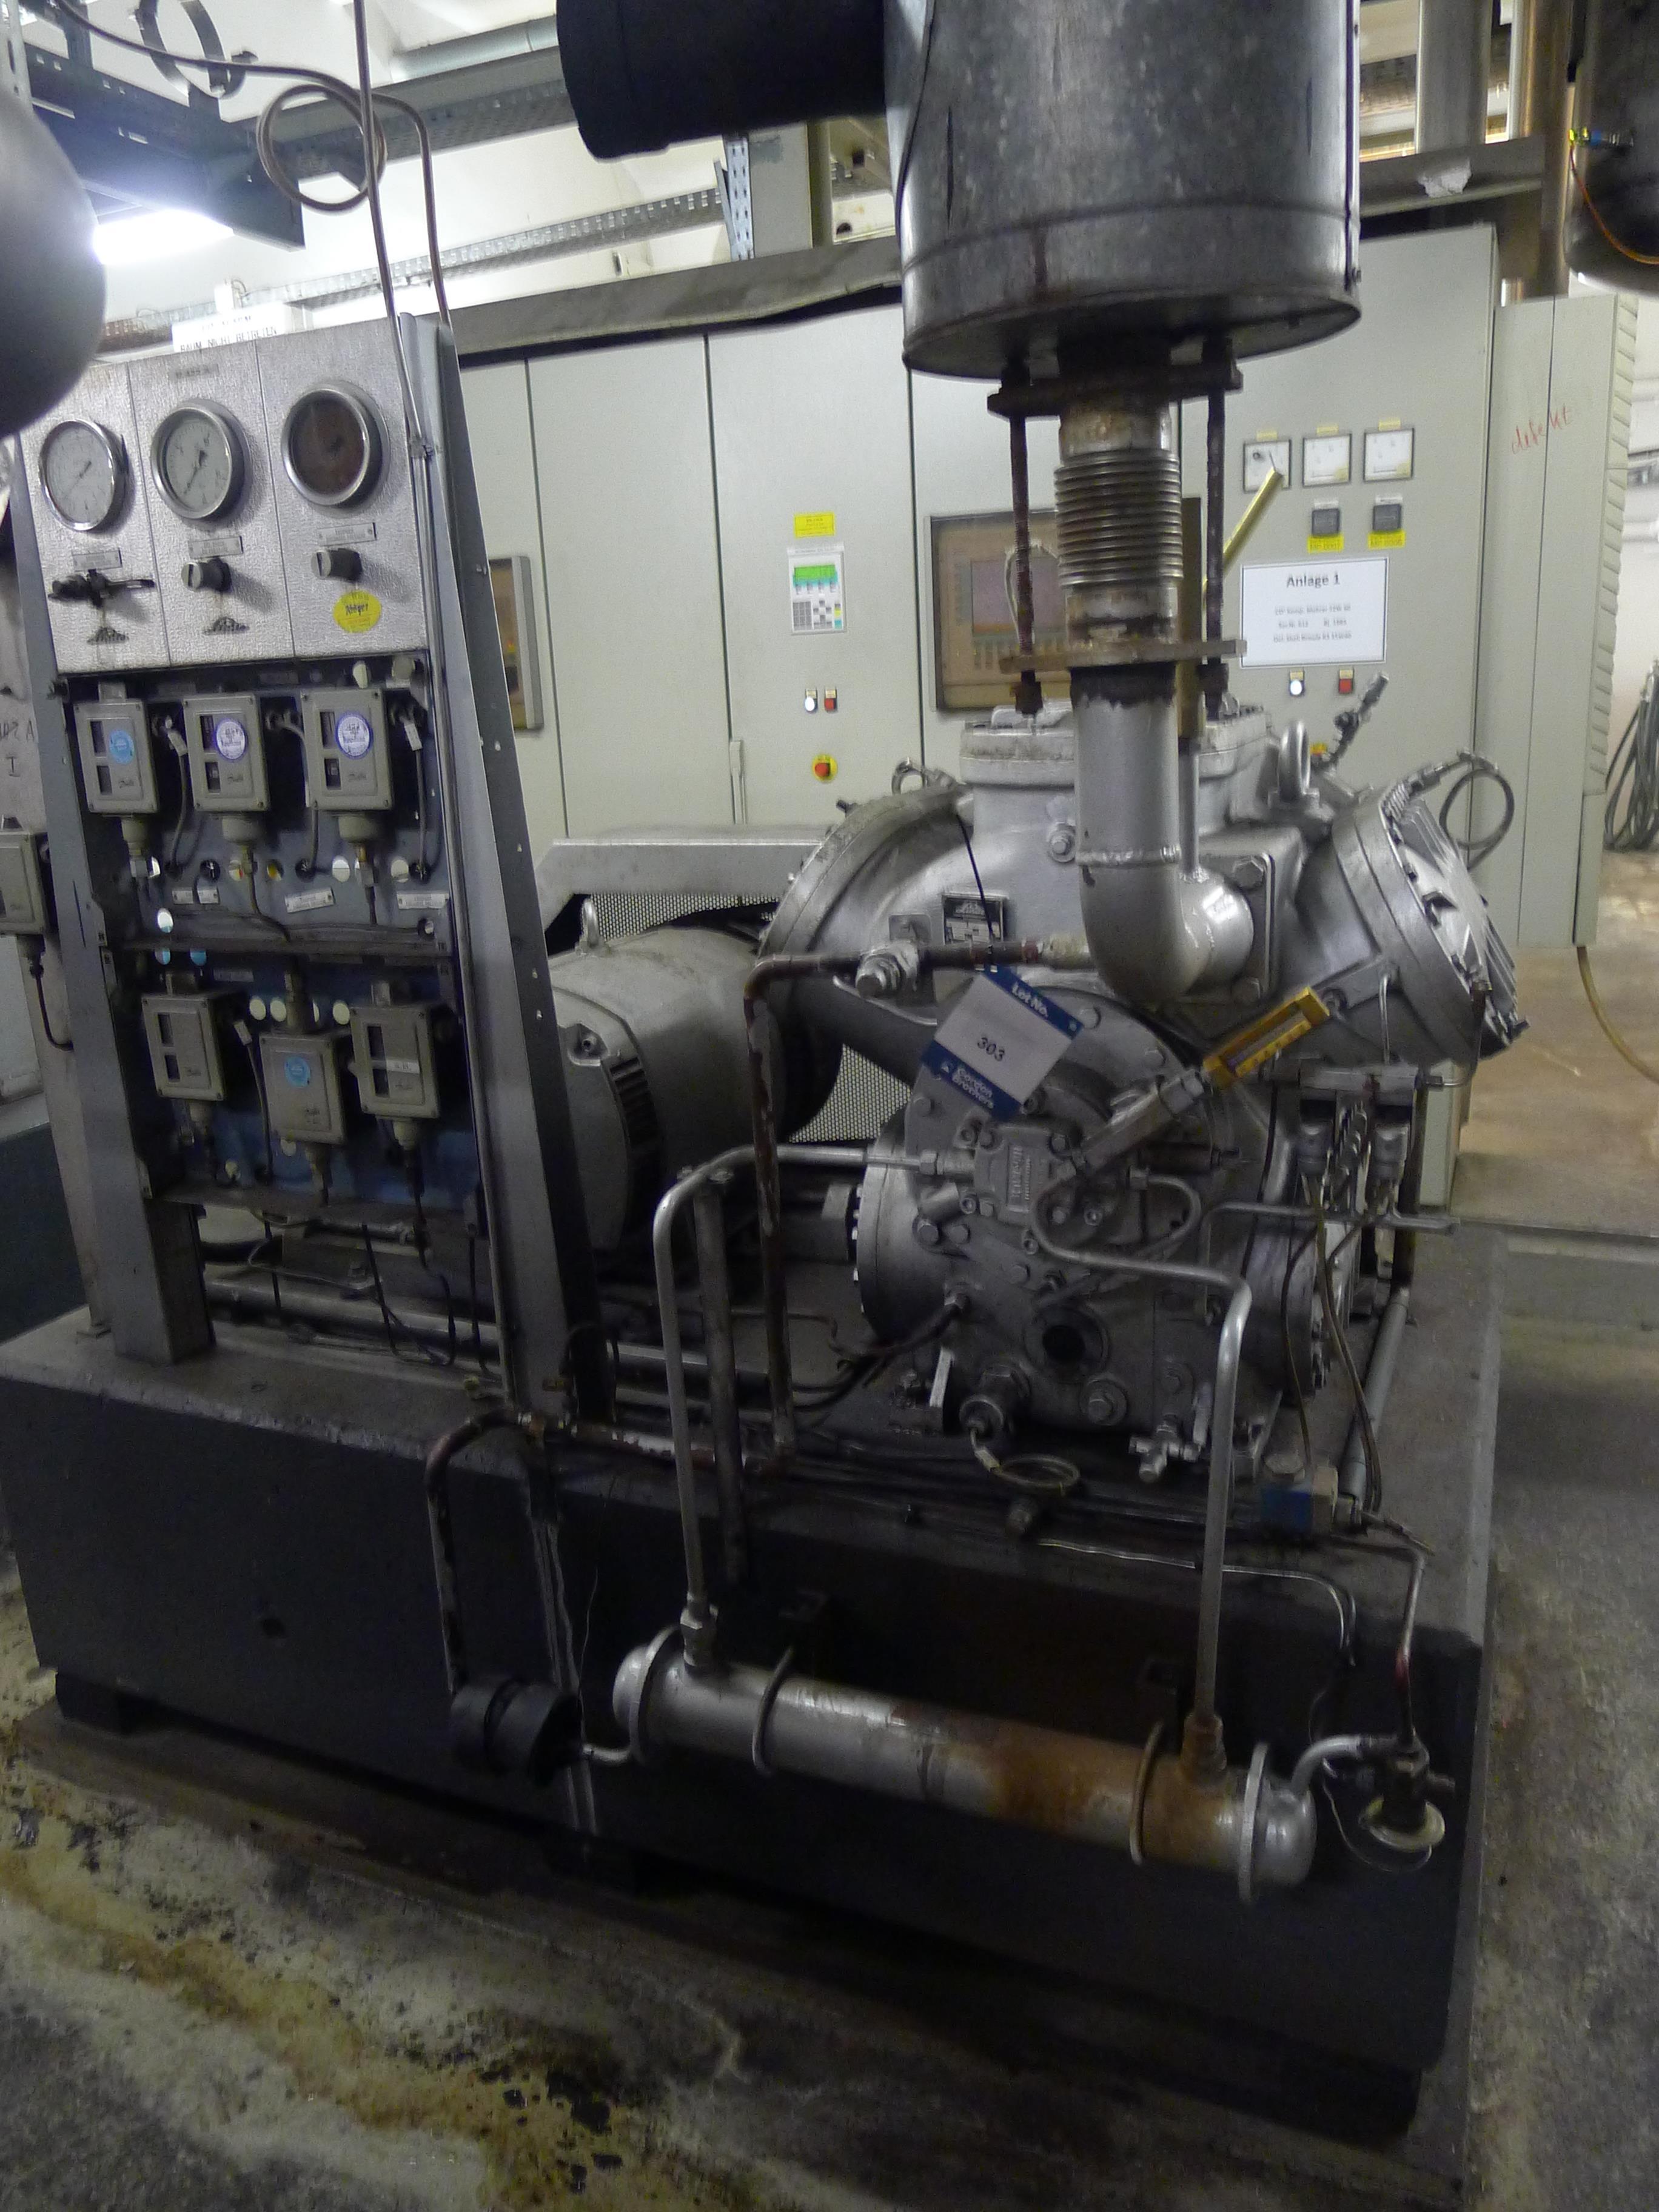 Lot 303 - Linde AAD6270 HKW VERC Cooling Compressor S/N D6387 (Dismantling and Loading Fee: €450)